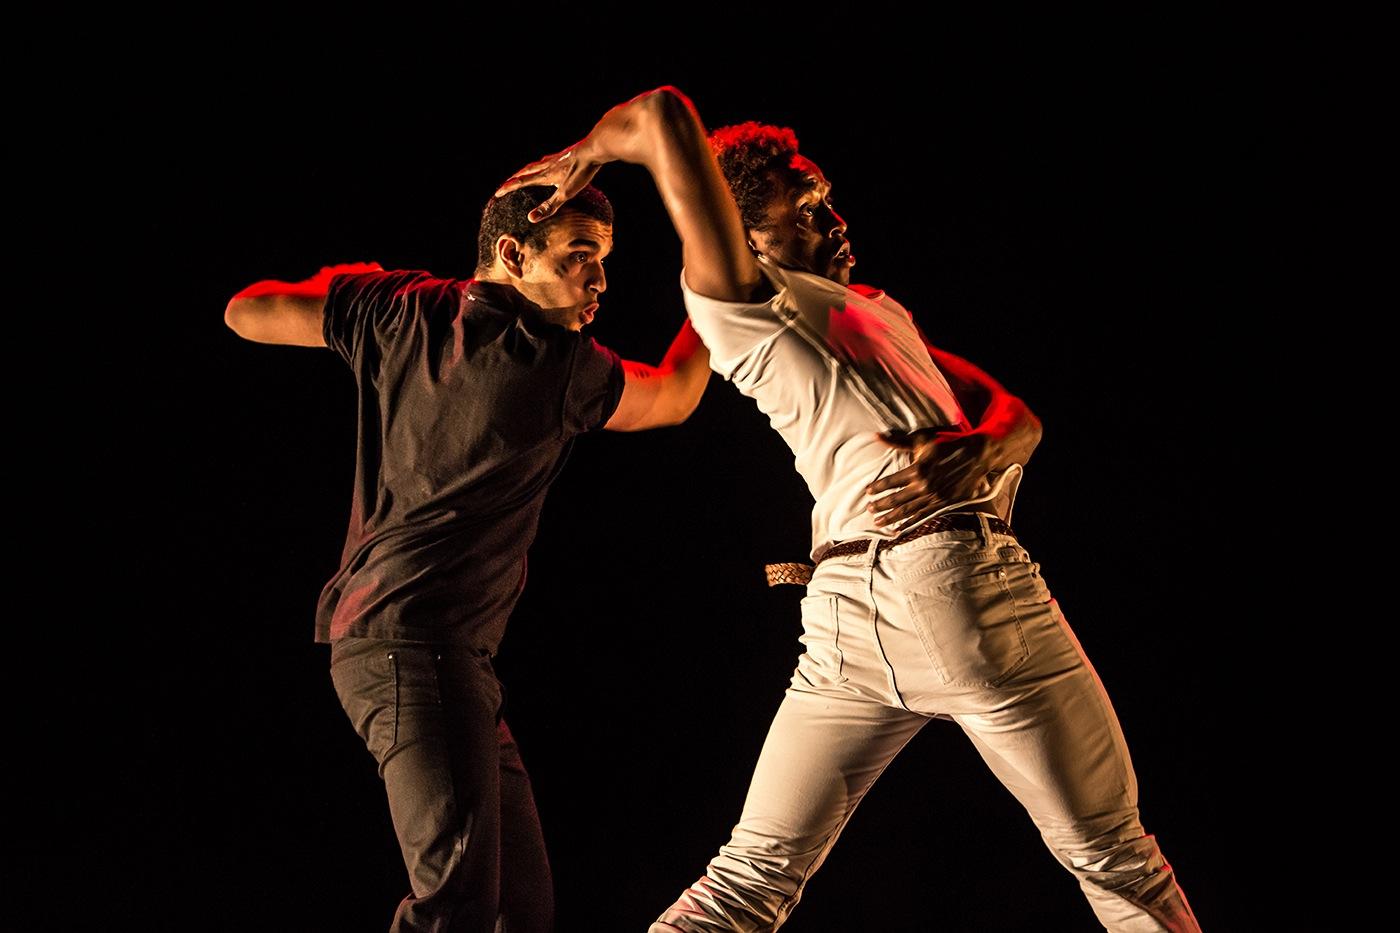 photographe-reportage-danse-avec-ton-crous-guillaume-heraud-001-small